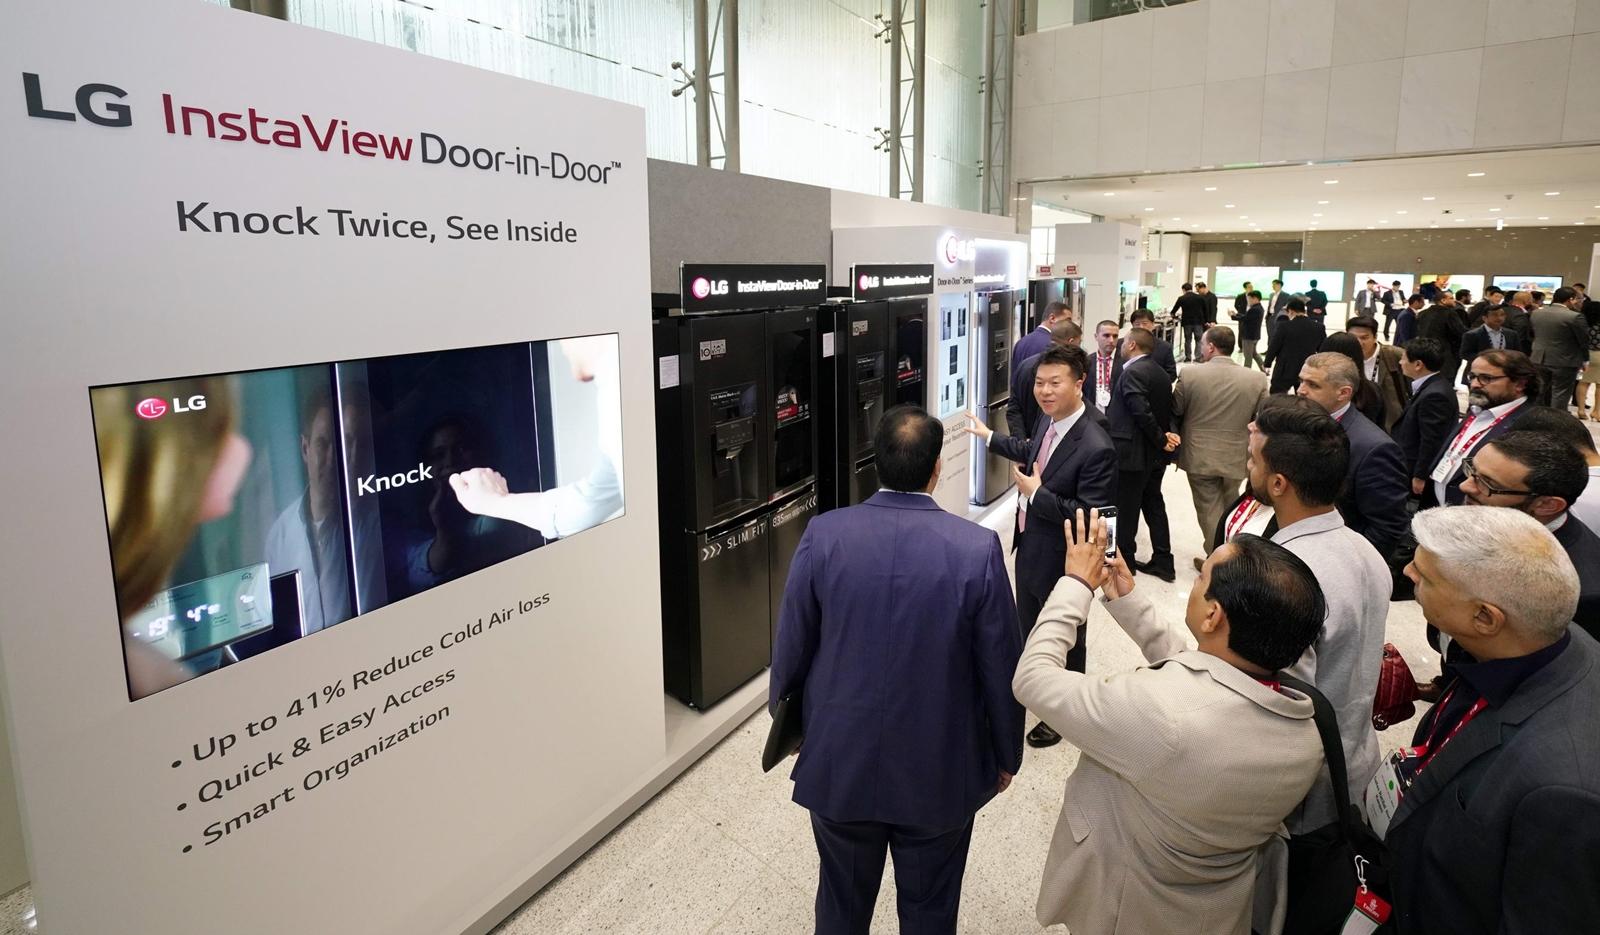 LG전자는 9일부터 11일까지 중동∙아프리카의 주요 거래선, 외신기자 등 약 200명을 한국으로 초청해 'LG 이노페스트'를 열었다. LG 이노페스트 참가자들이 똑똑 두드리면 안쪽이 보이는 인스타뷰 냉장고 등 프리미엄 가전을 체험하고 있다.